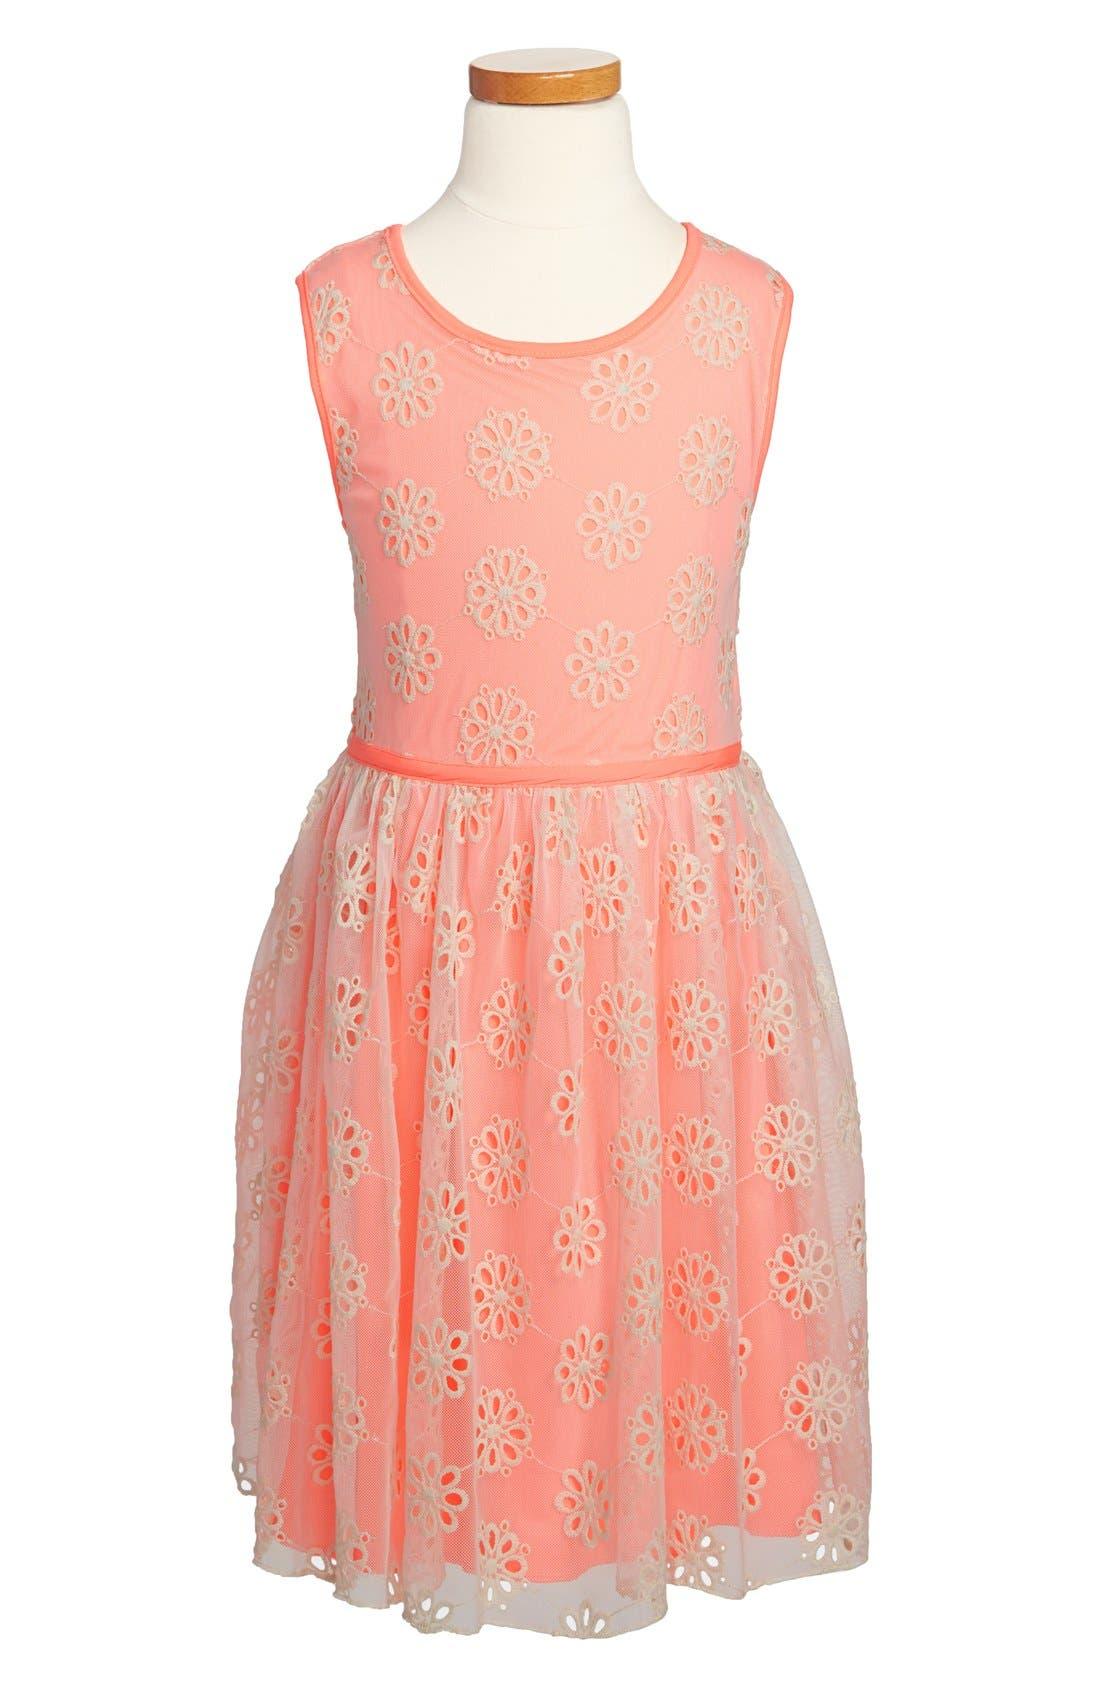 Main Image - Zunie Embroidered Sleeveless Dress (Little Girls & Big Girls)